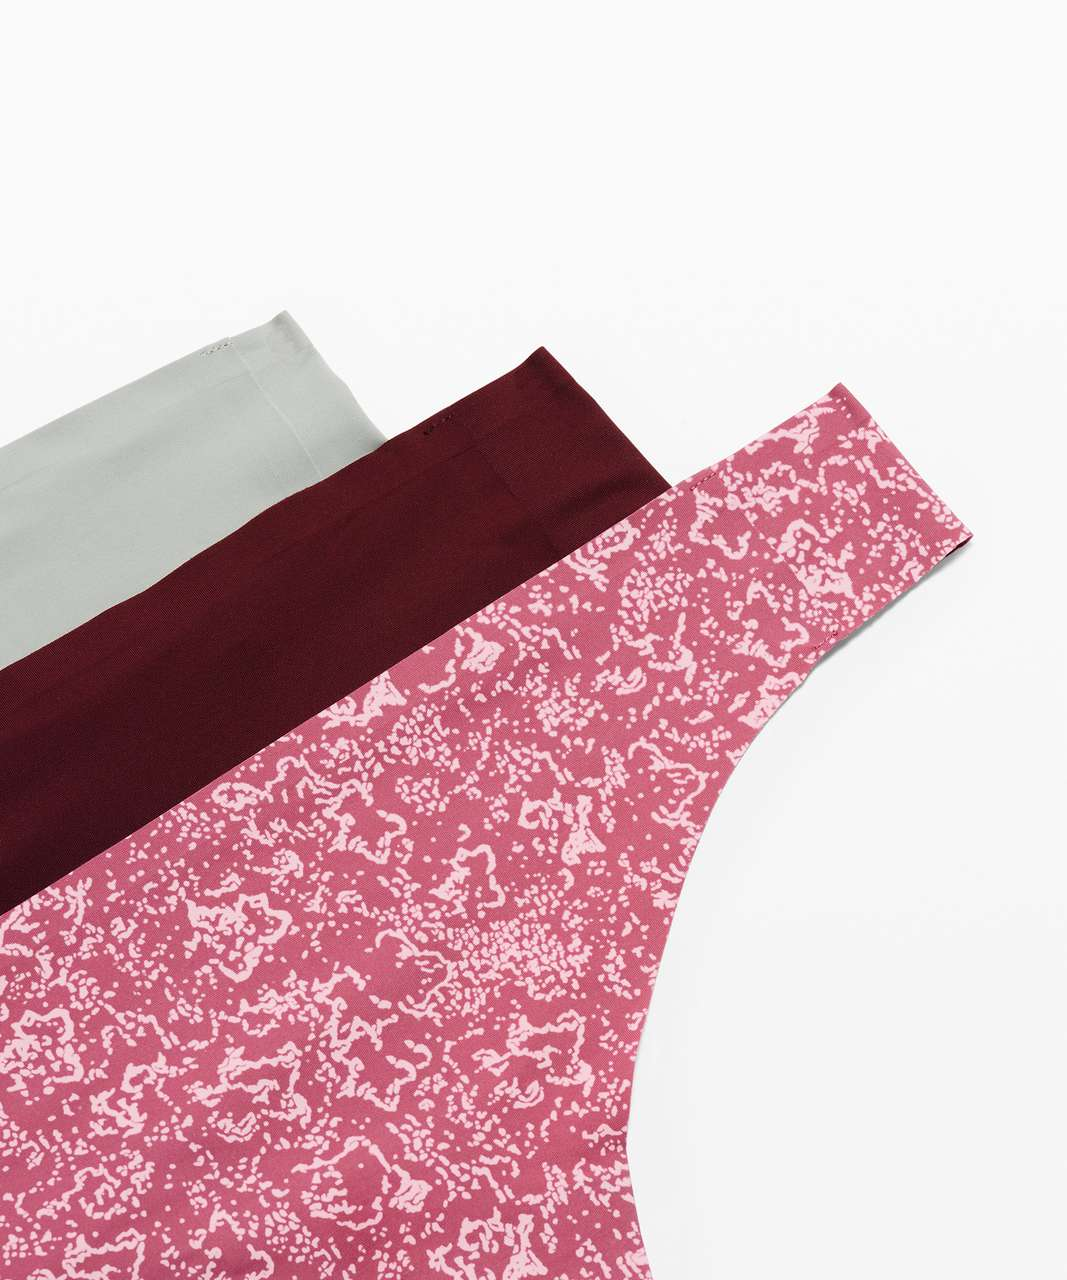 Lululemon Namastay Put Thong 3 Pack - Floral Stitch Pink Taupe Moss Rose / Garnet / Jade Grey